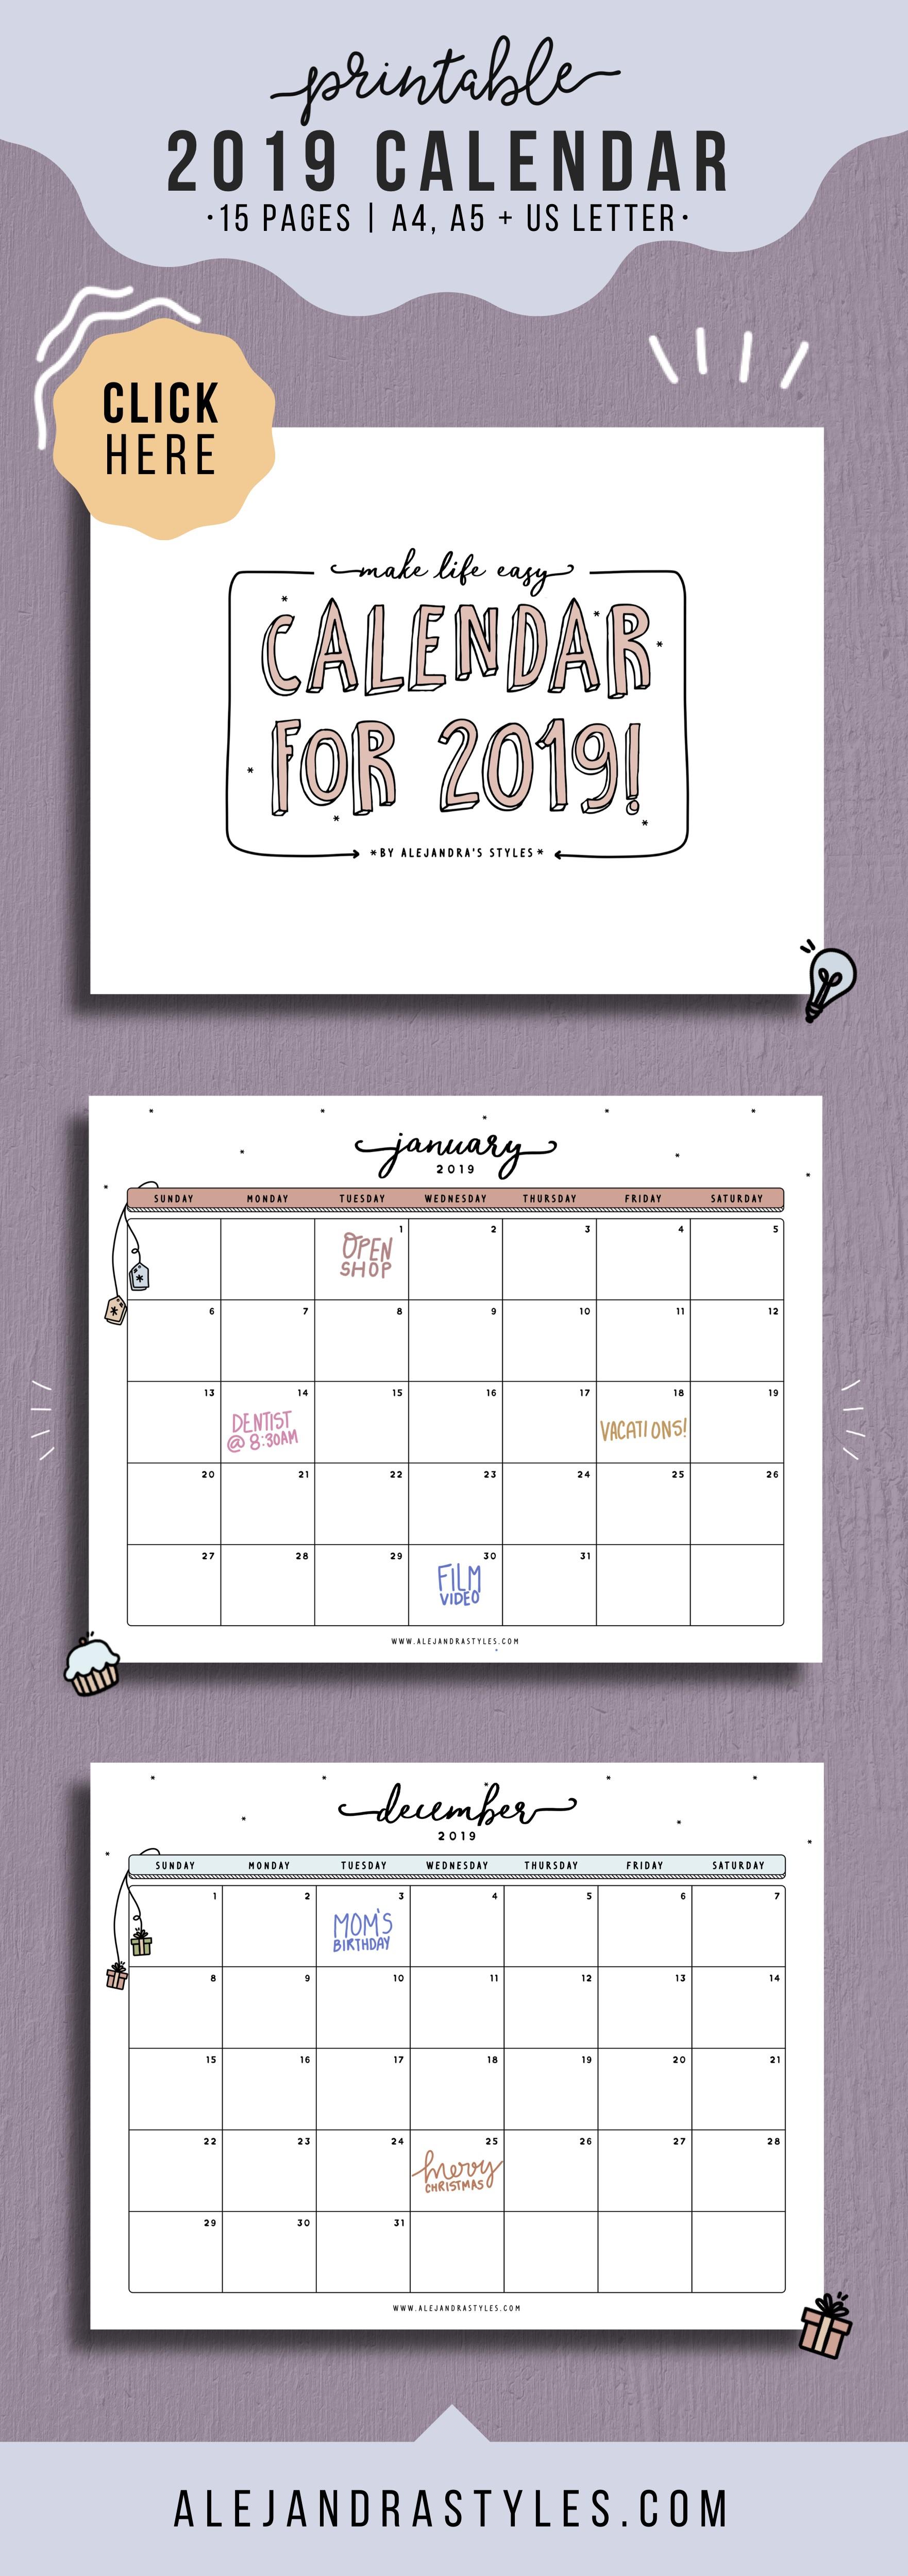 2019 Calendar Planner Book Más Recientes 2019 Calendar Printable Planner for Desk or Wall Of 2019 Calendar Planner Book Más Recientes 5 Star Fice 2019 Year Planner Mounted Landscape with Planner Kit